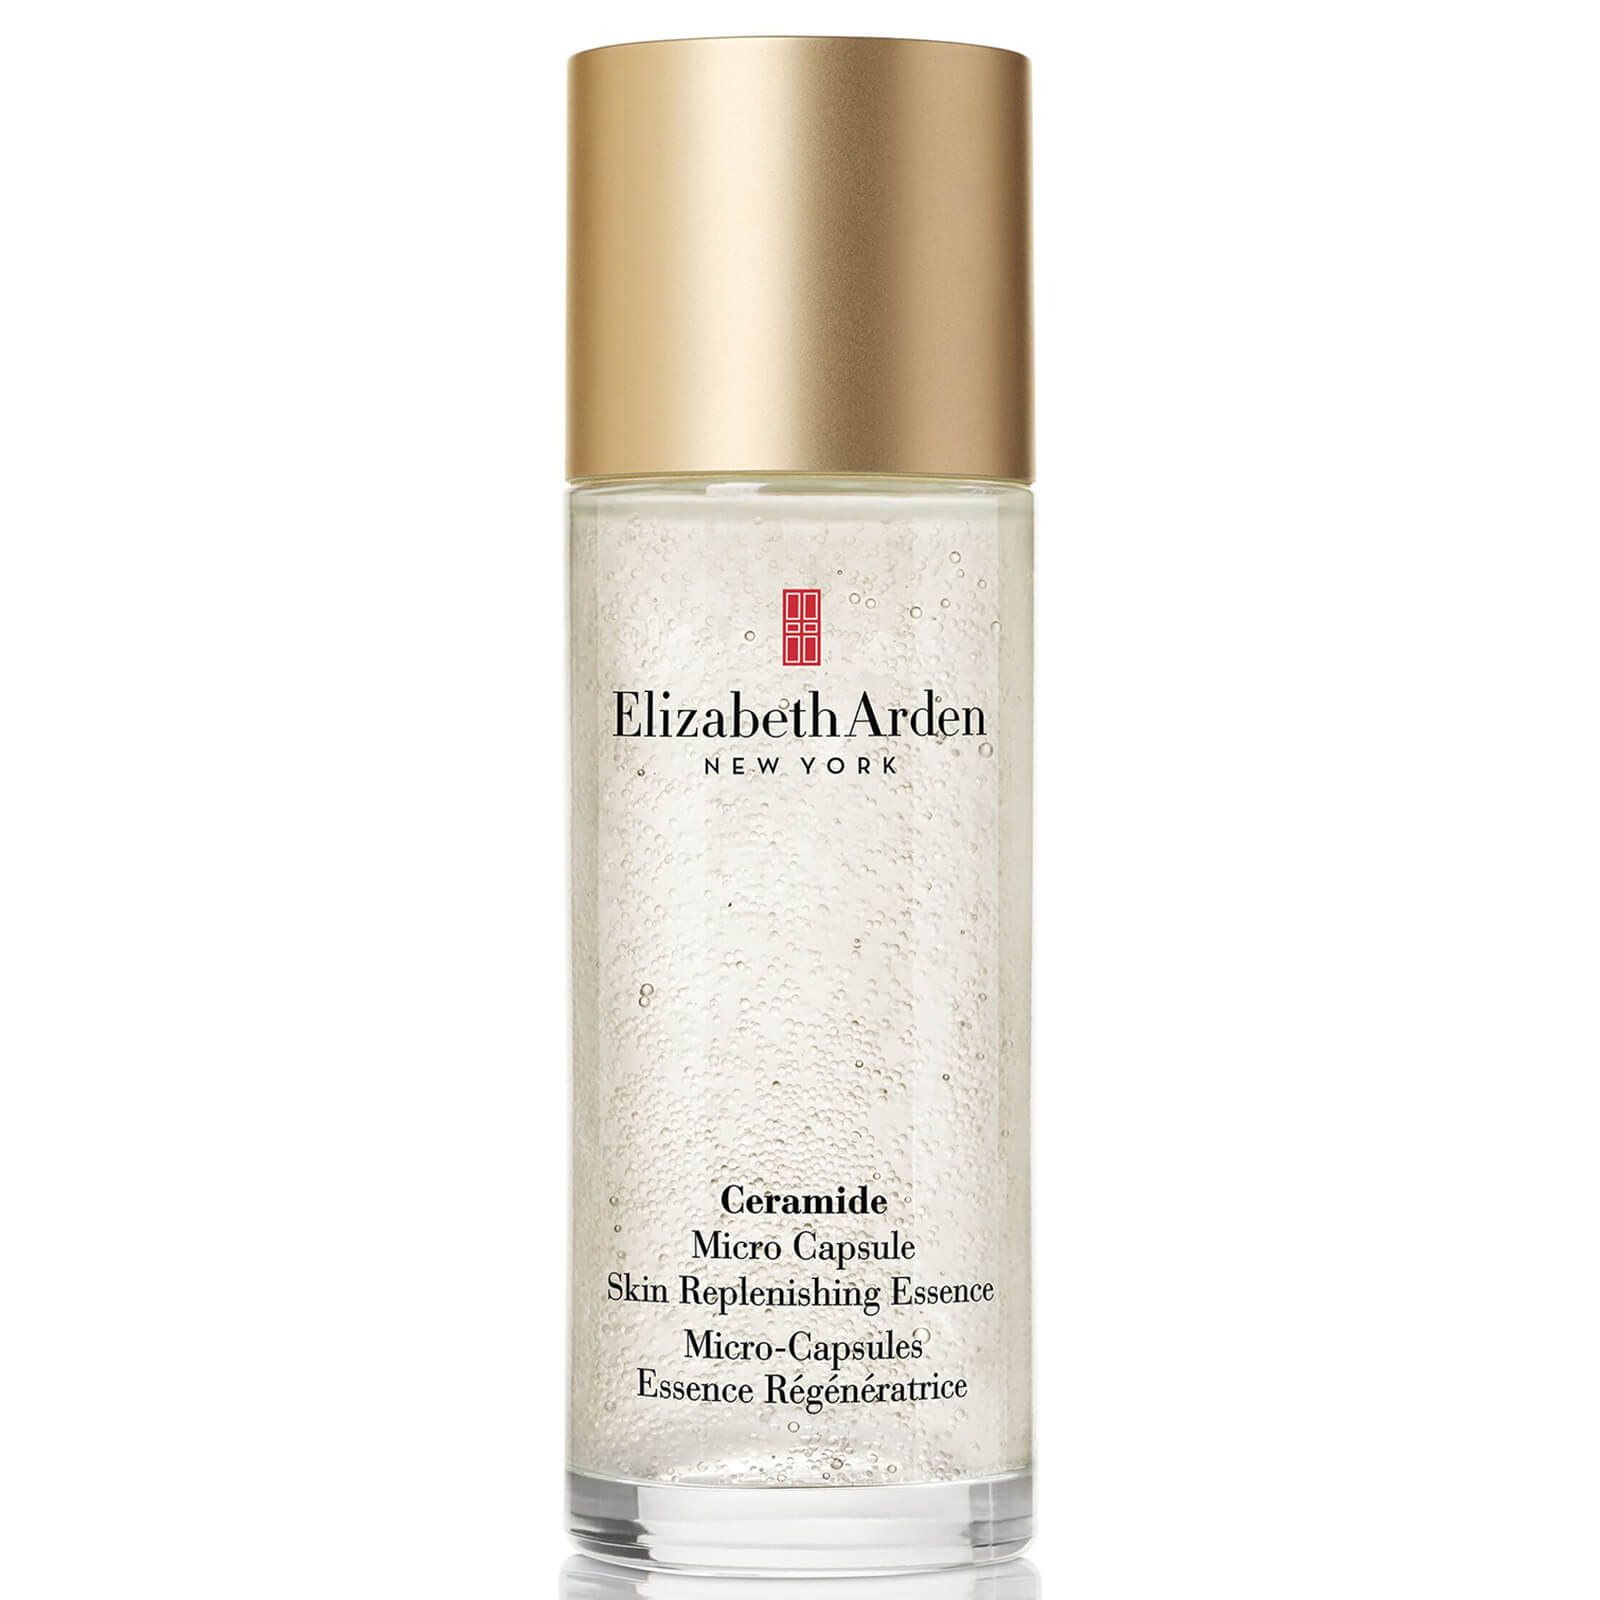 Elizabeth Arden Ceramide Micro Capsule Skin Replenishing Essence 90ml